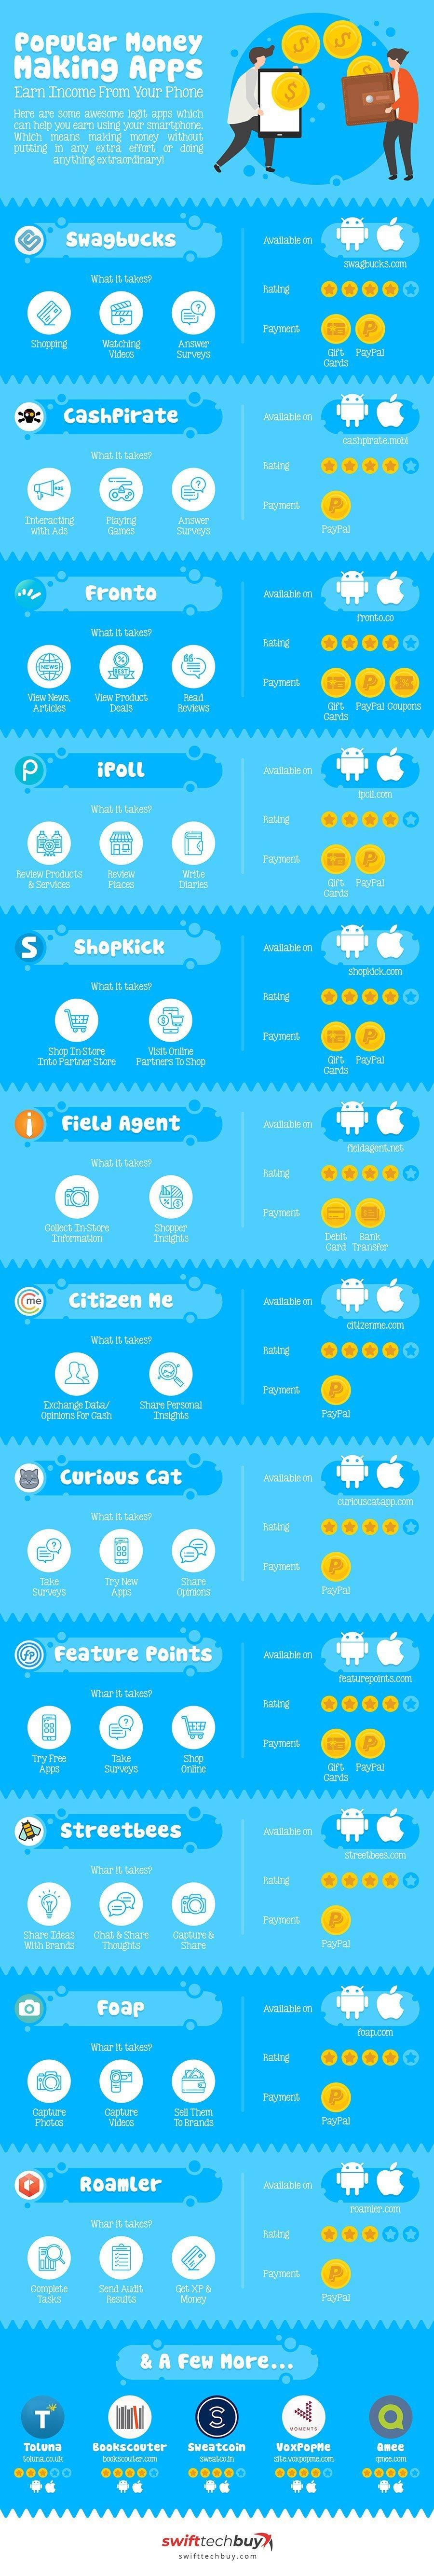 SwiftTechBuy IG MoneyMakingApps - Money Making Apps